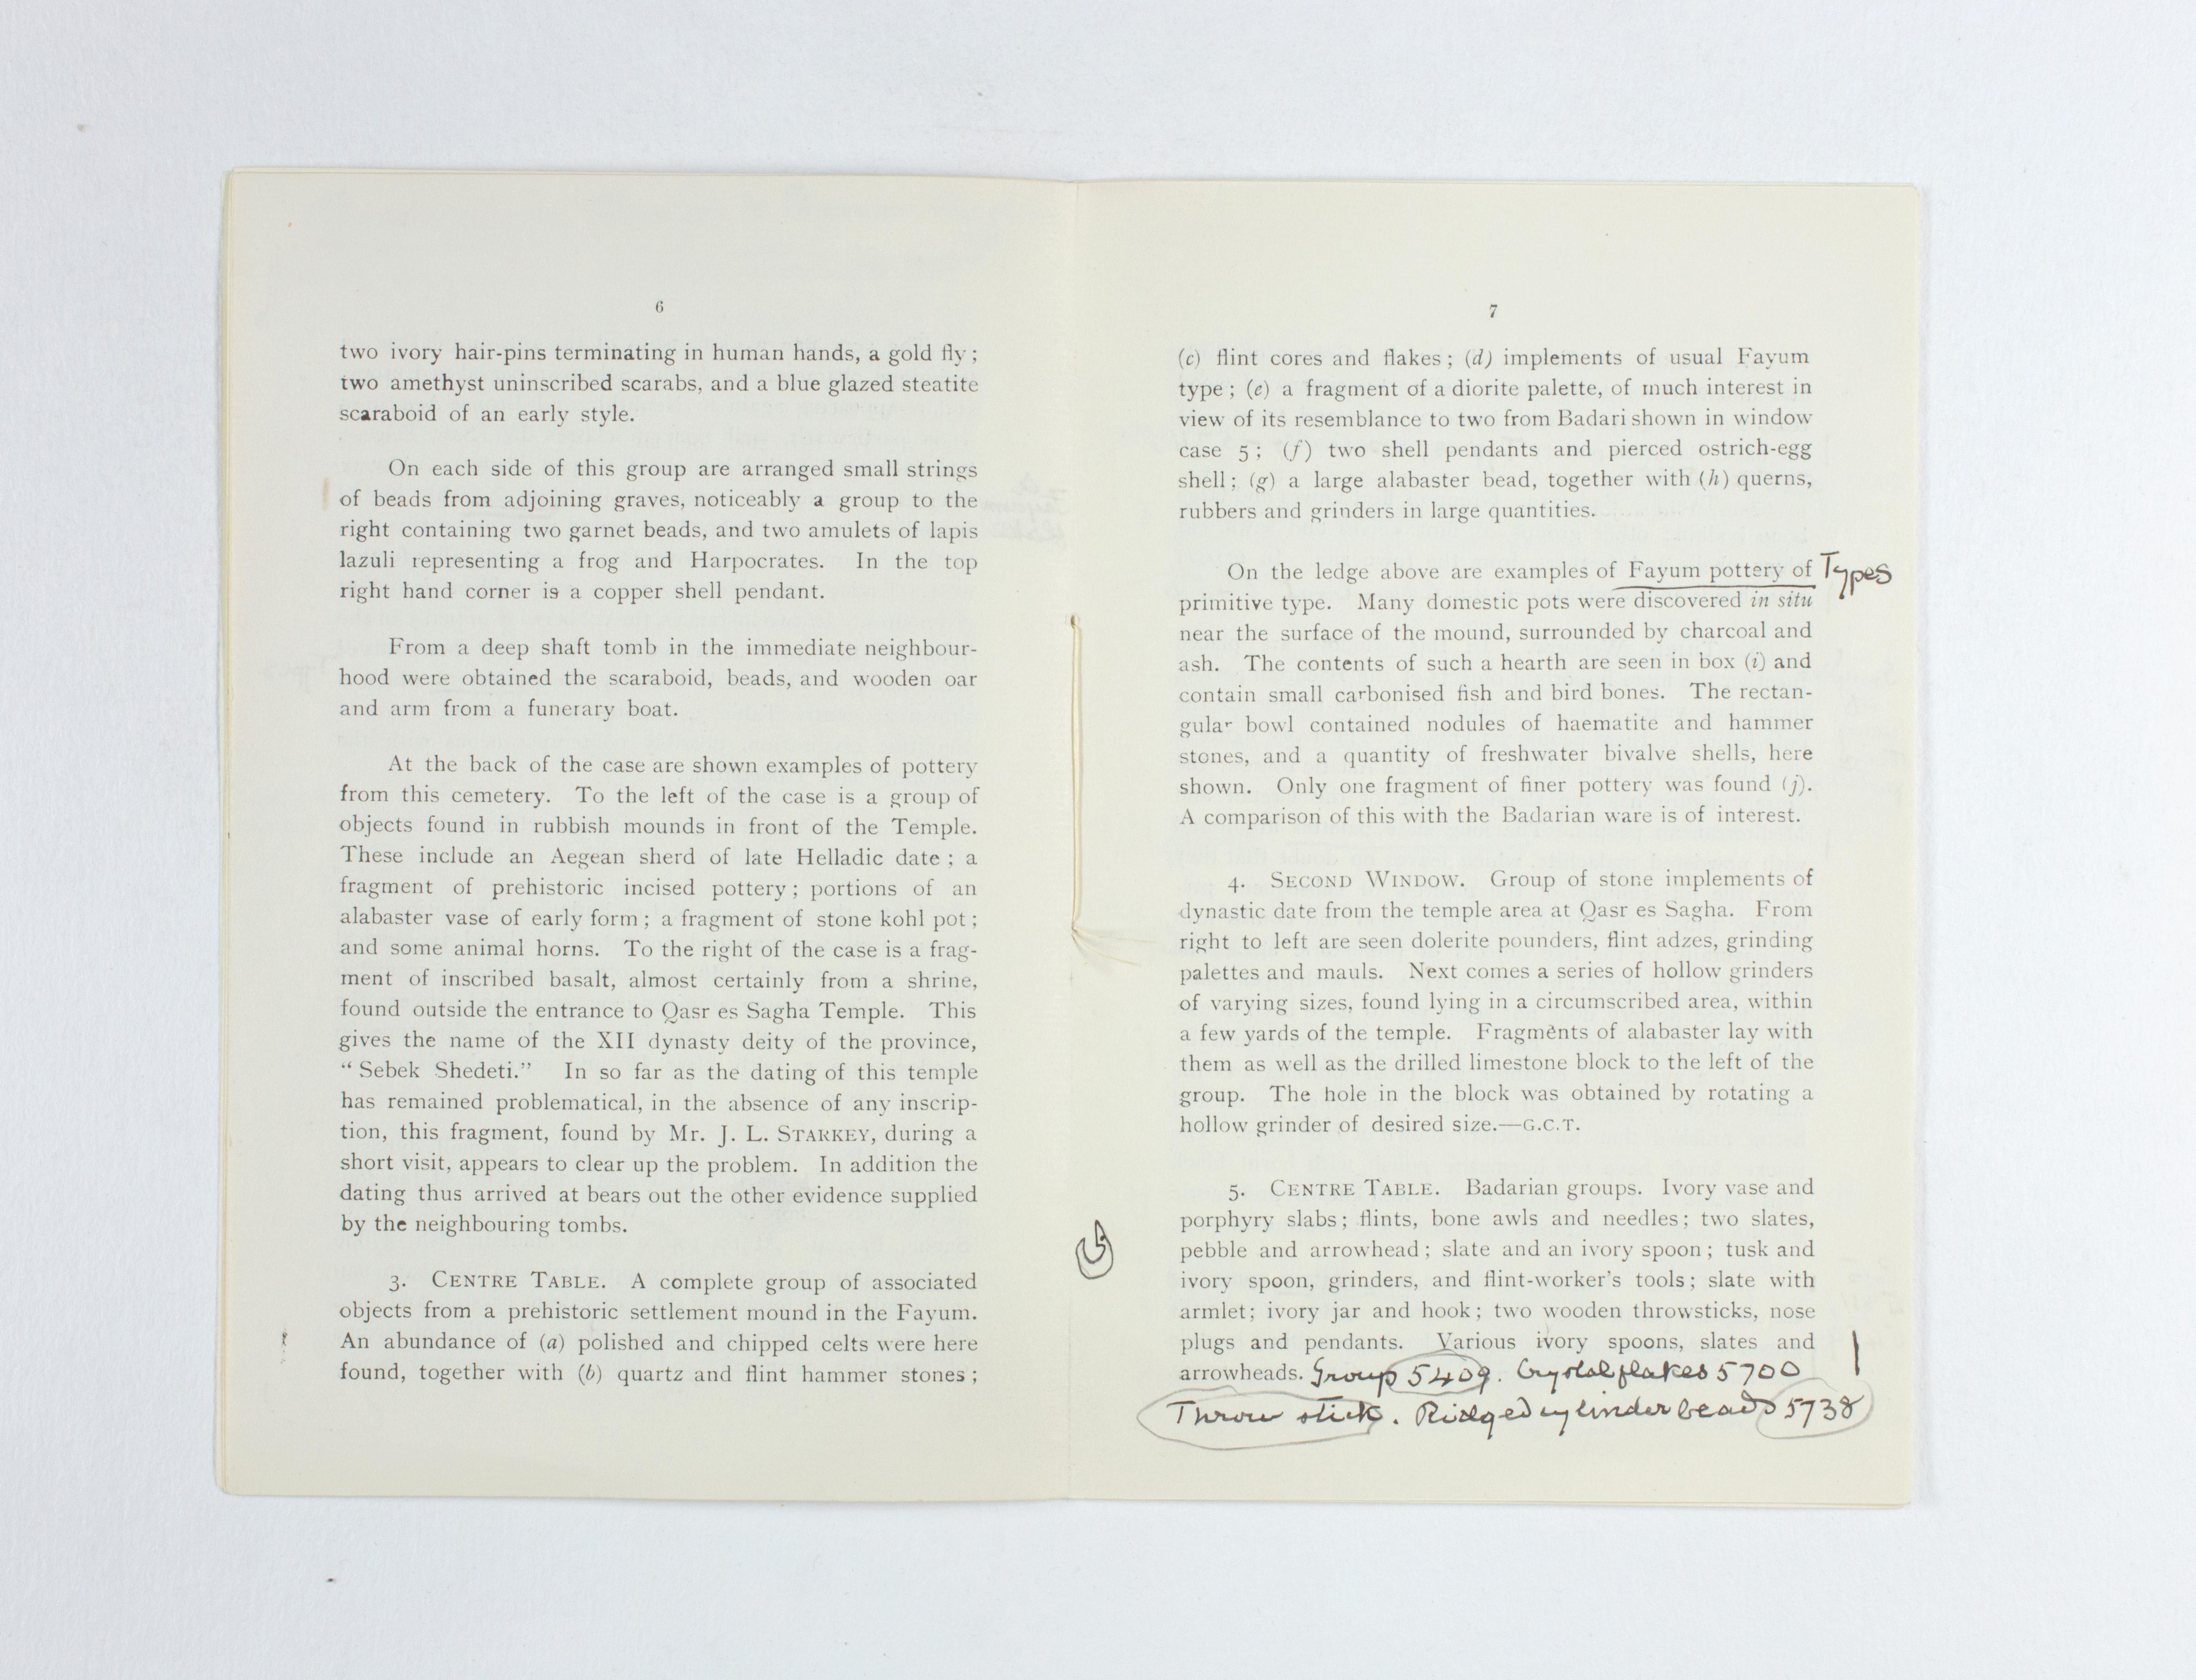 1924-25 Badari, Faiyum Exhibition catalogue PMA/WFP1/D/28/31.5